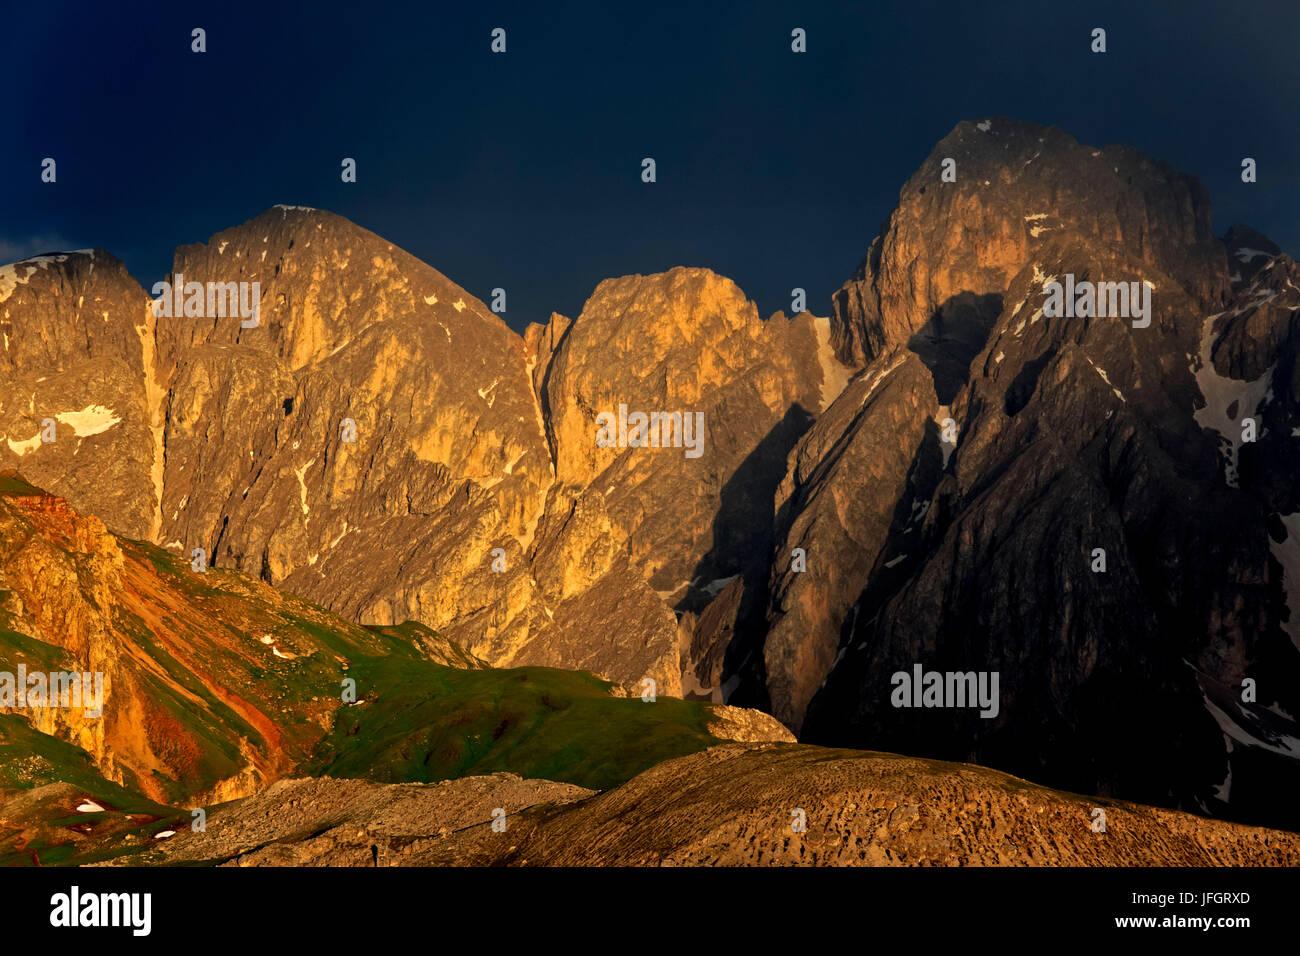 Italy, region Trentino South Tirol, province Bolzano, the Dolomites, to Schlern, thunderstorm about the Antermoiakogel, - Stock Image